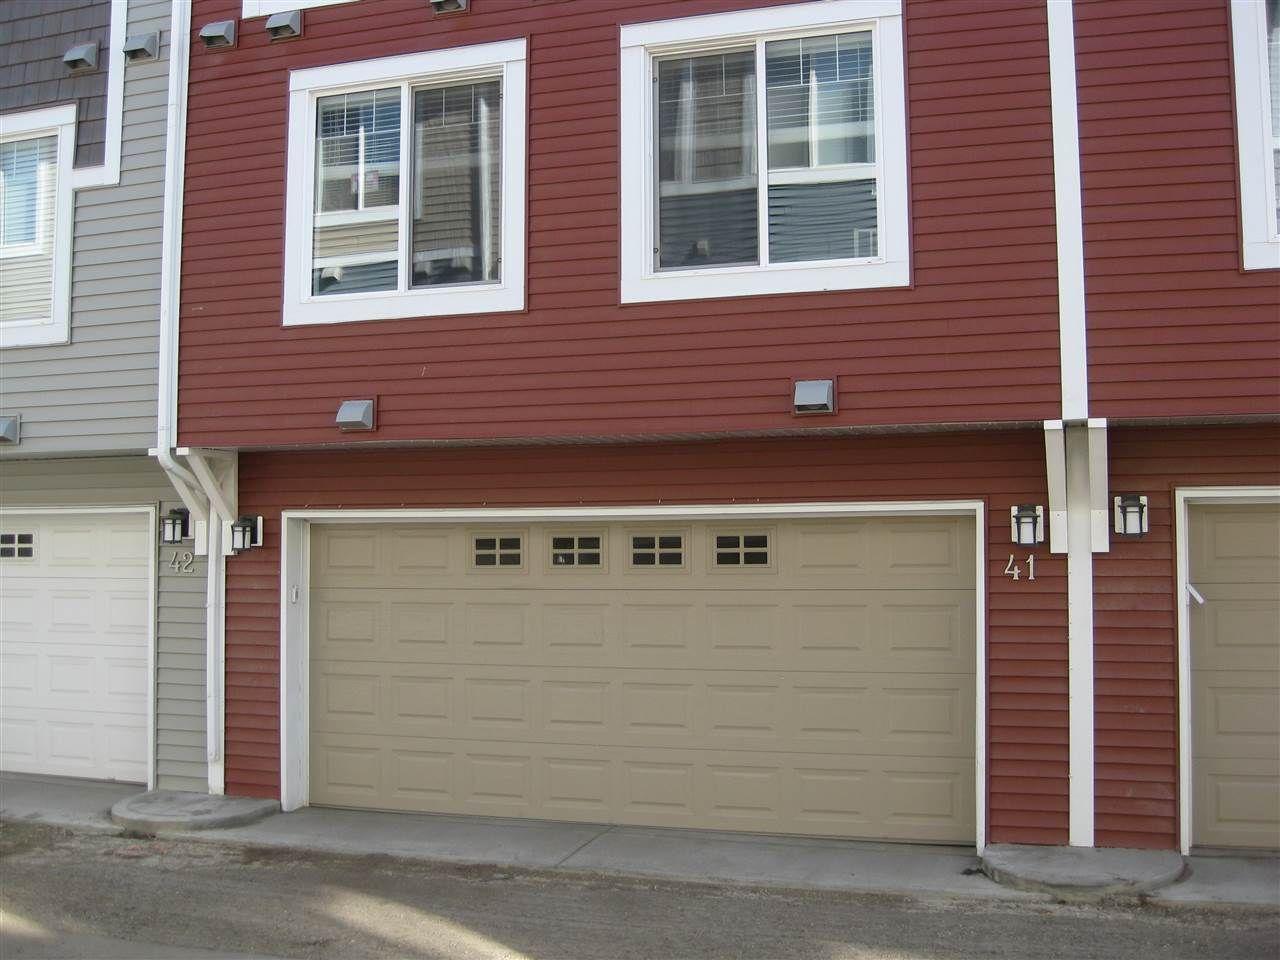 Photo 24: Photos: #41 3625 144 AV NW in Edmonton: Zone 35 Townhouse for sale : MLS®# E4016087